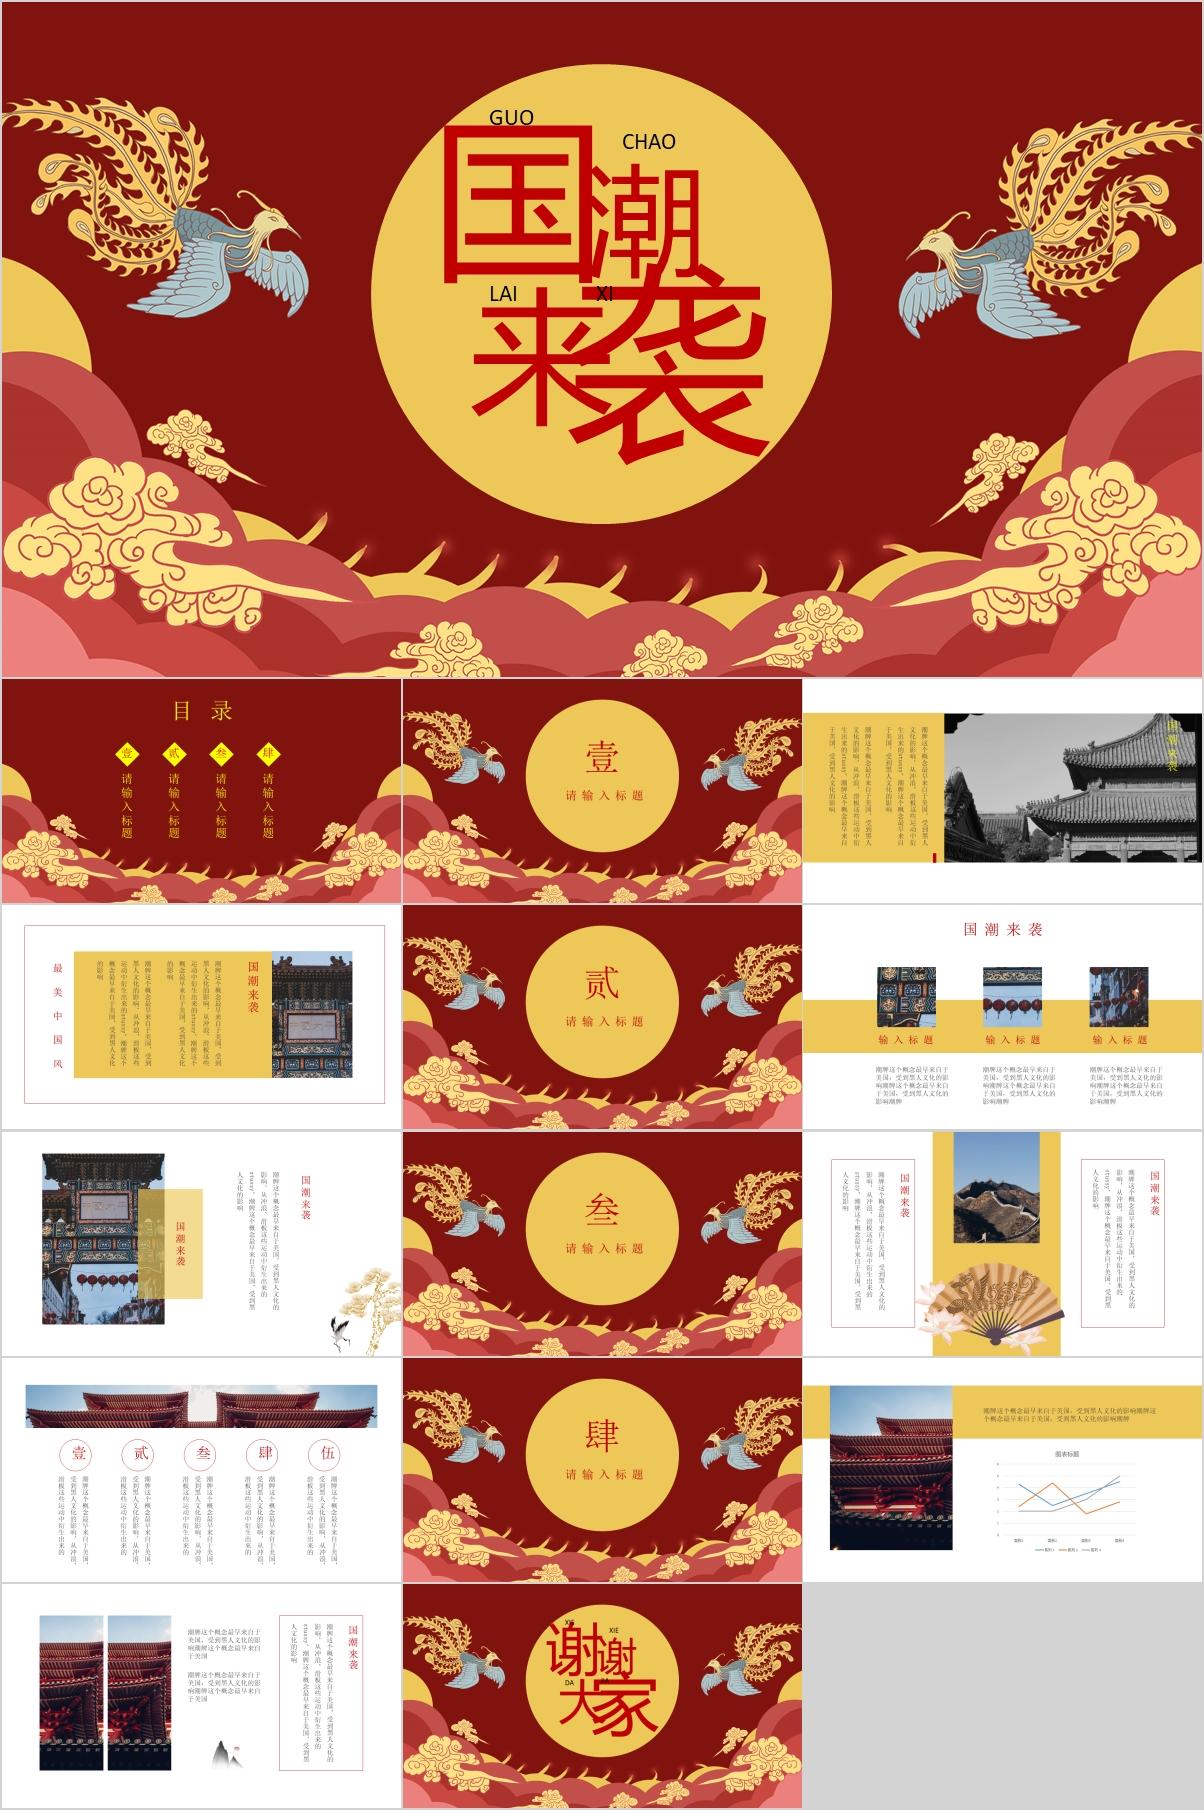 【PPT】国潮红色中国风通用PPT模板-爱资源分享